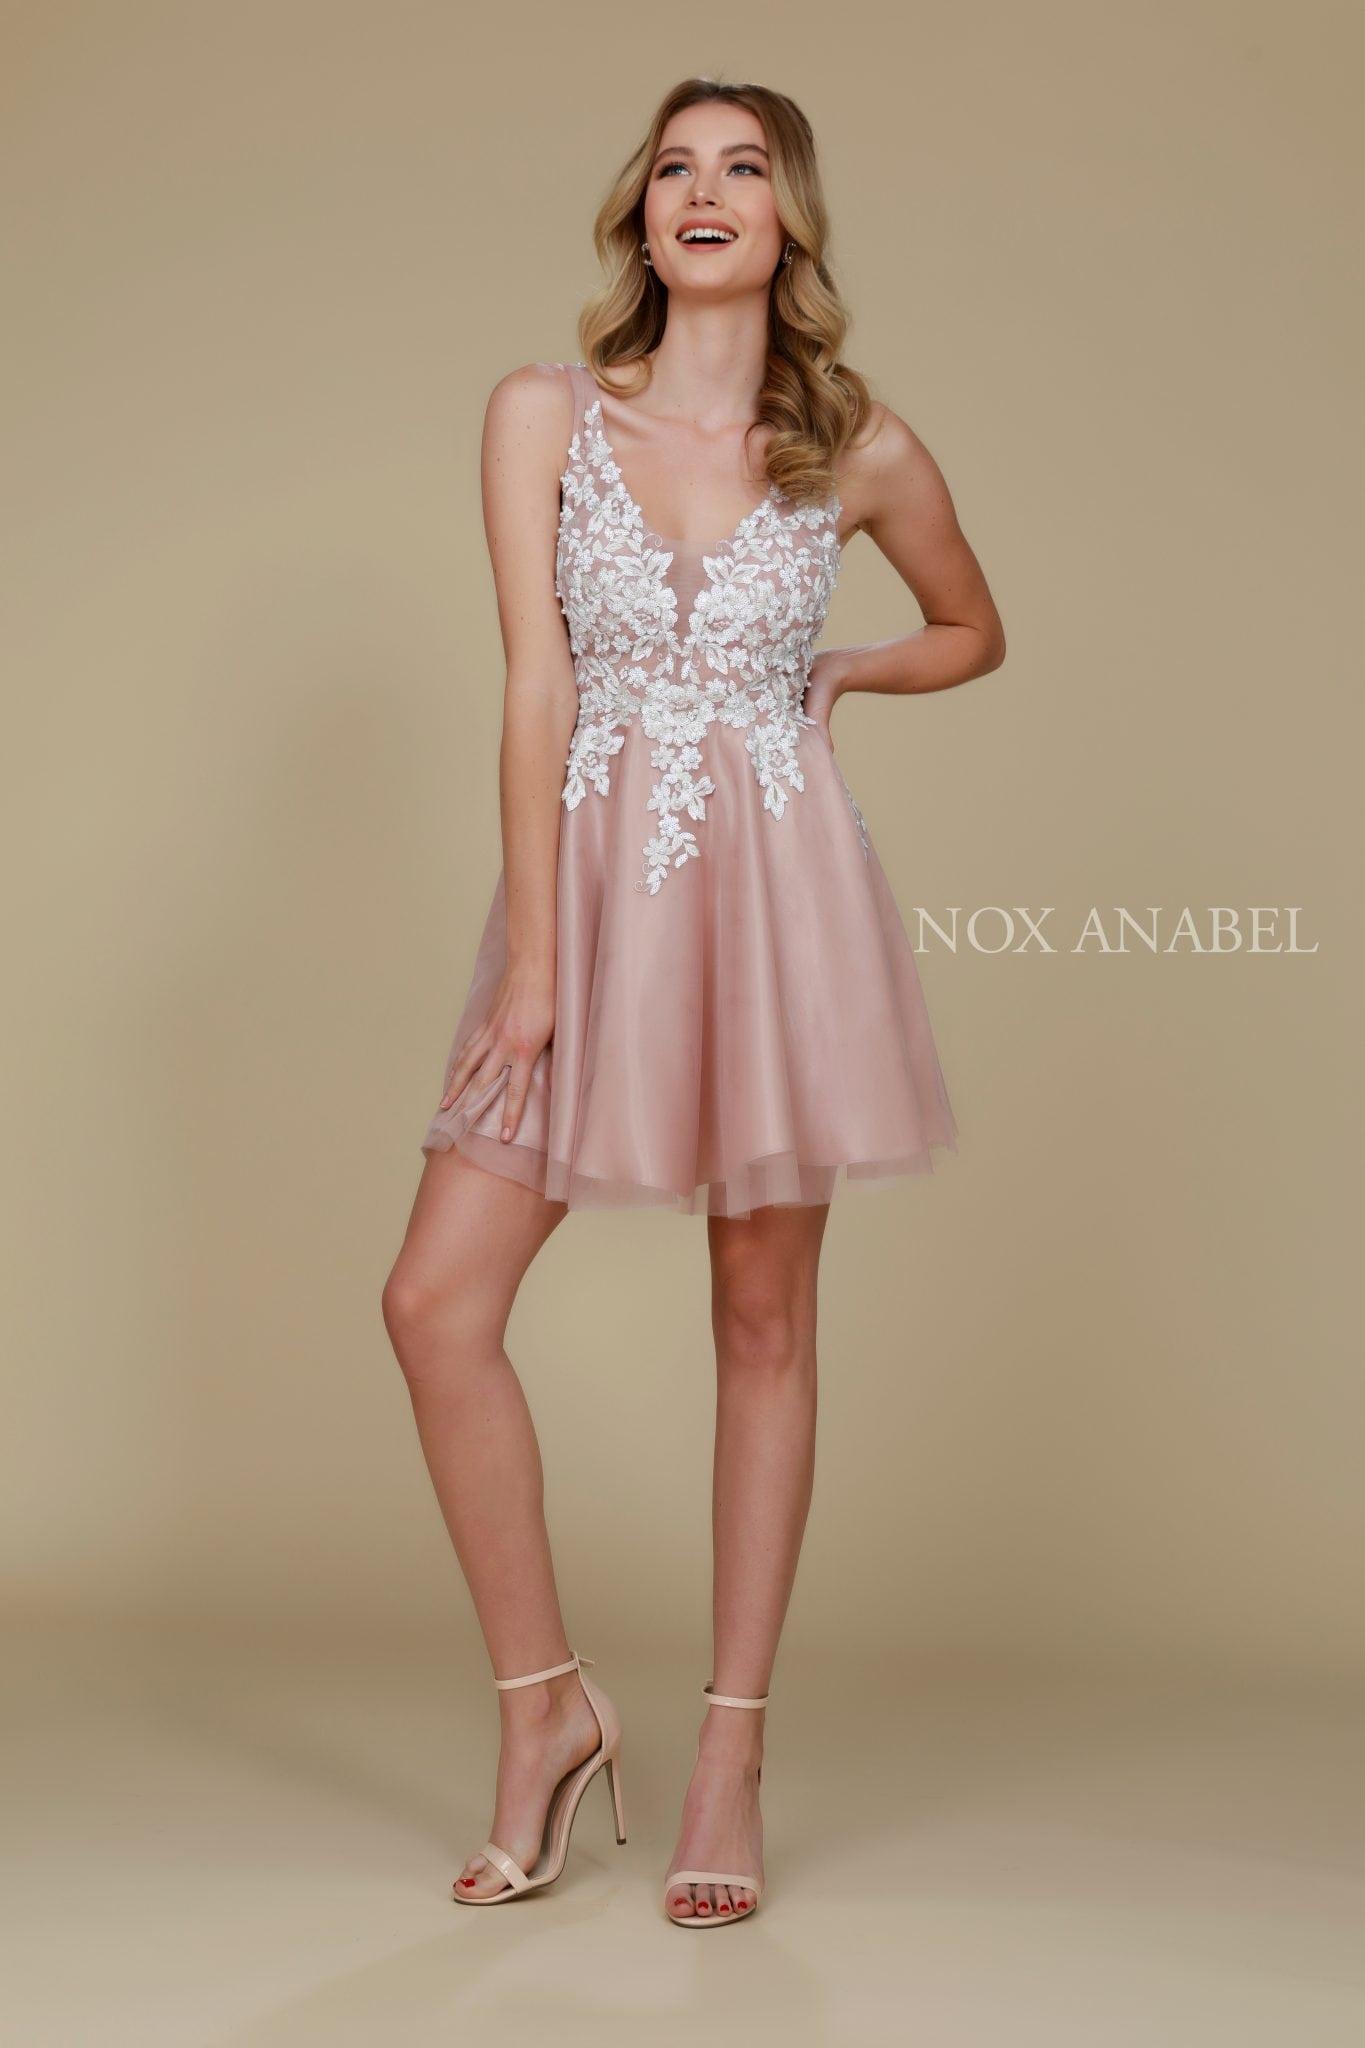 Nox Anabel G669 | Limelight Dresses